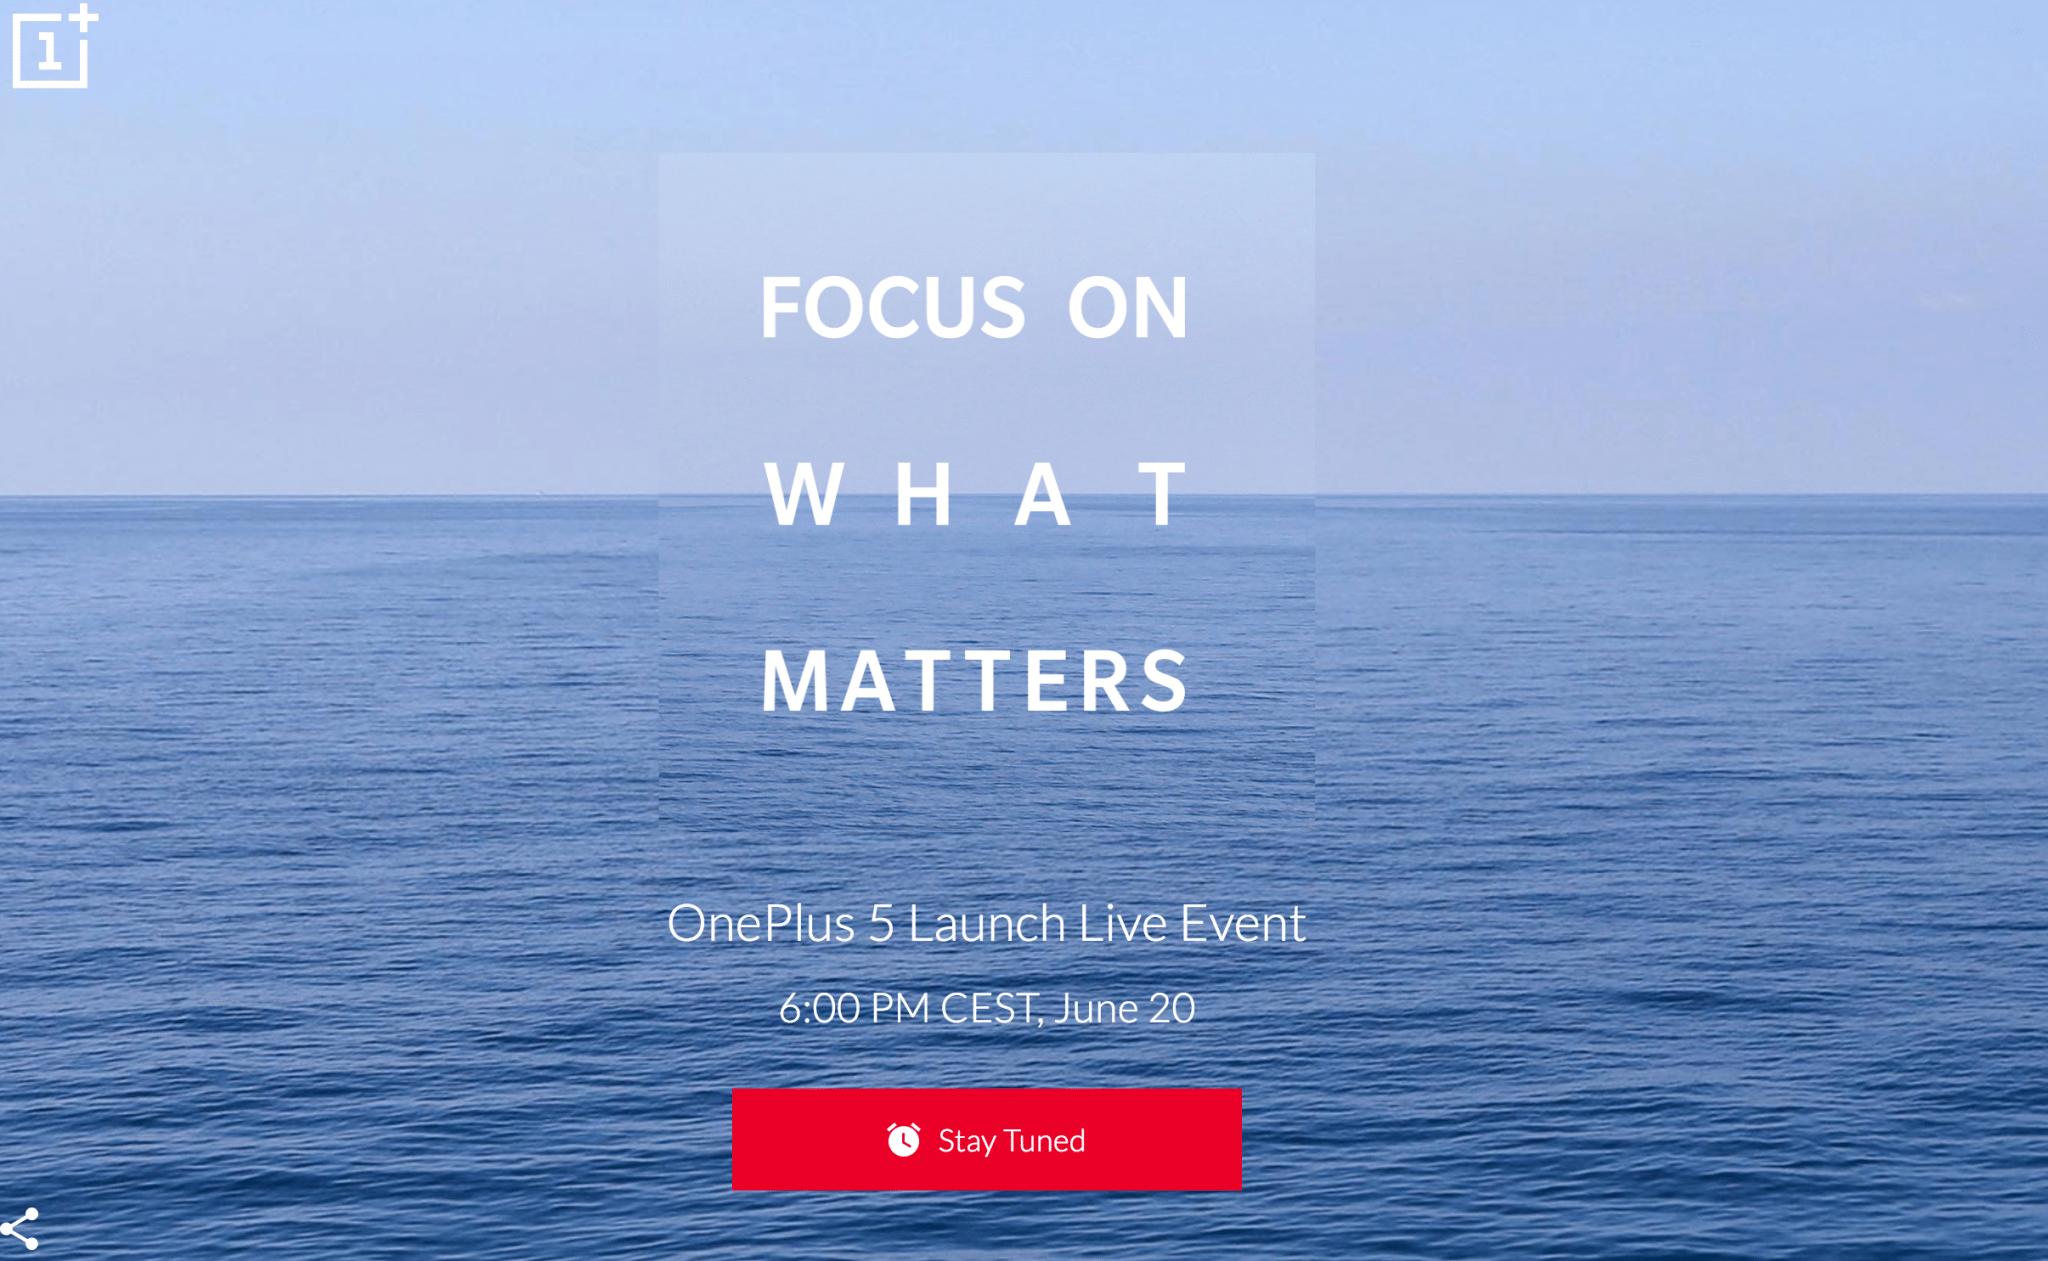 OnePlus-5-teasing